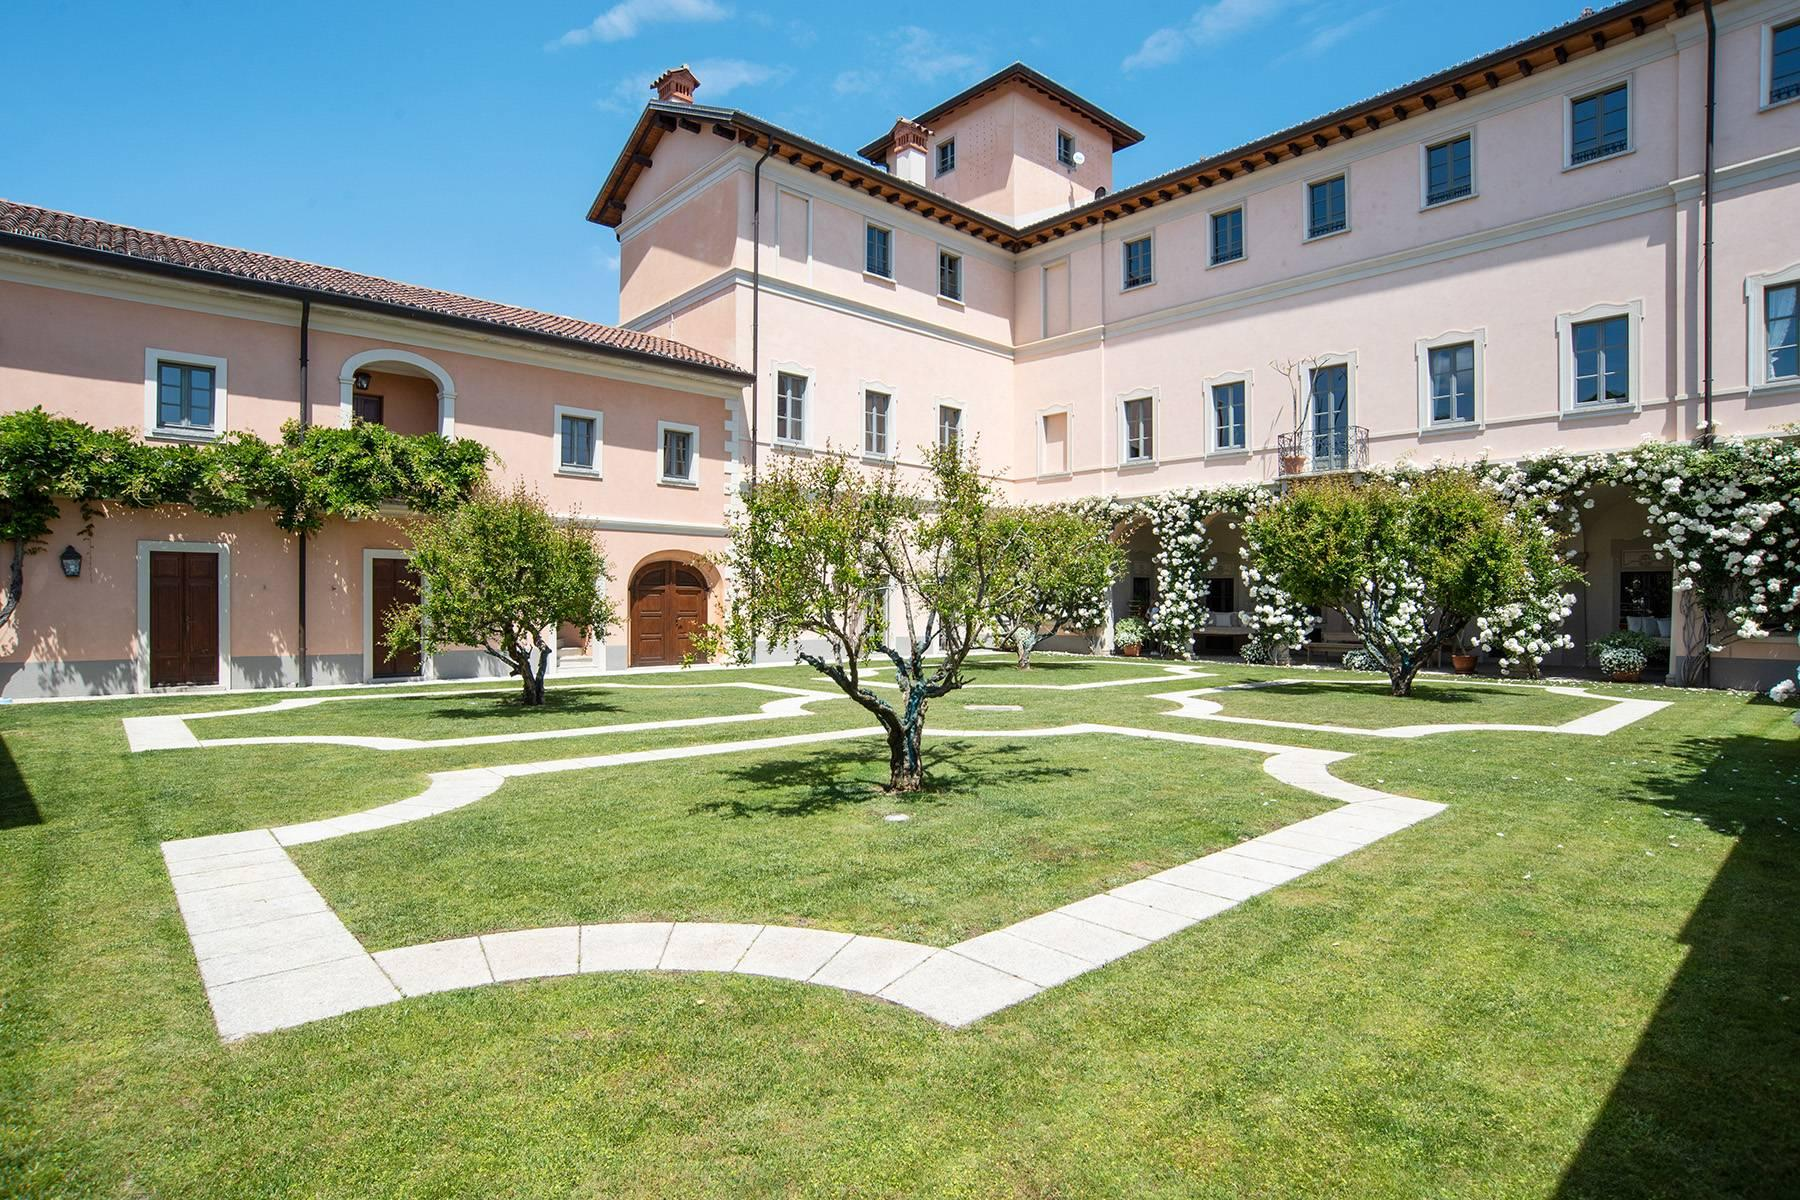 Antico Borgo Piemontese a due passi dal lago Maggiore - 32